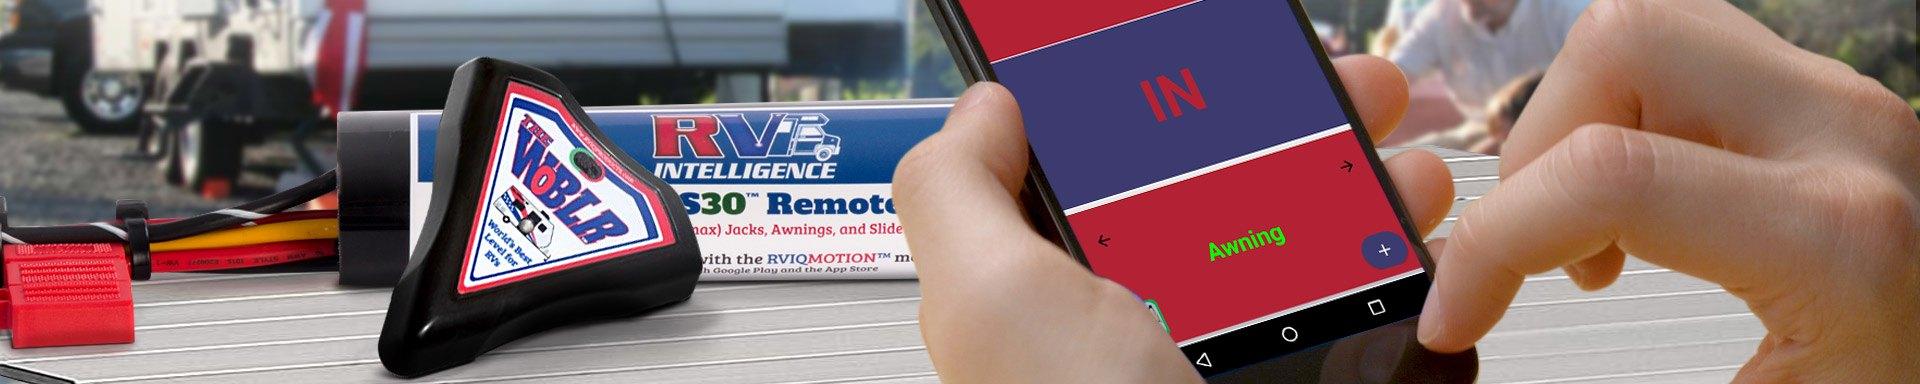 RV Intelligence™   Remote Controls, Straps, Electronics - CAMPERiD com